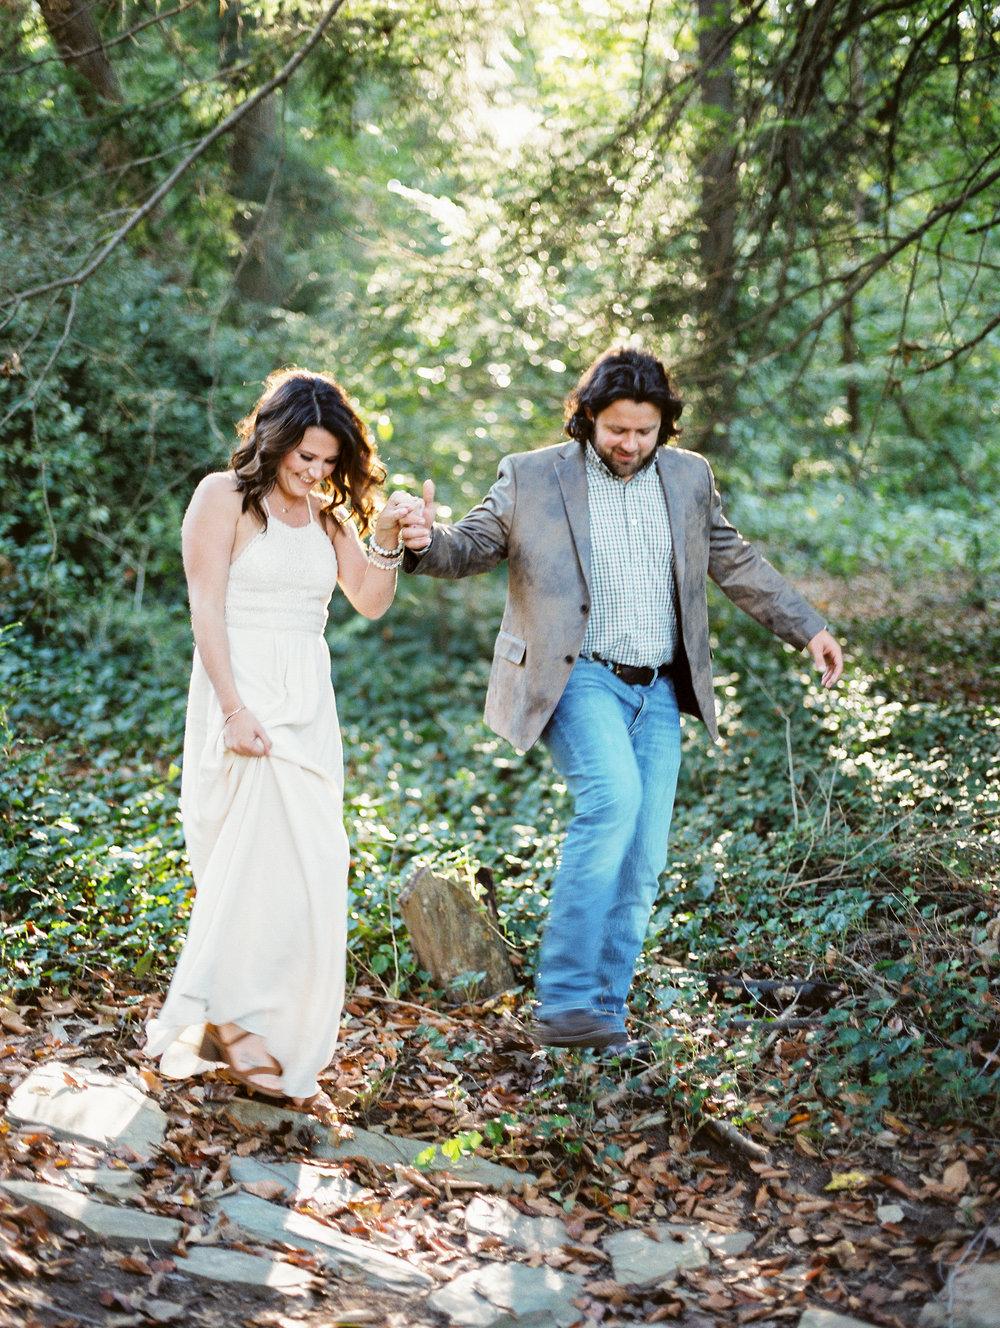 Jenna_Sam_Engagment_Cator_Woolford_Gardens_Atlanta_Georgia_Fallen_Photography-62.JPG